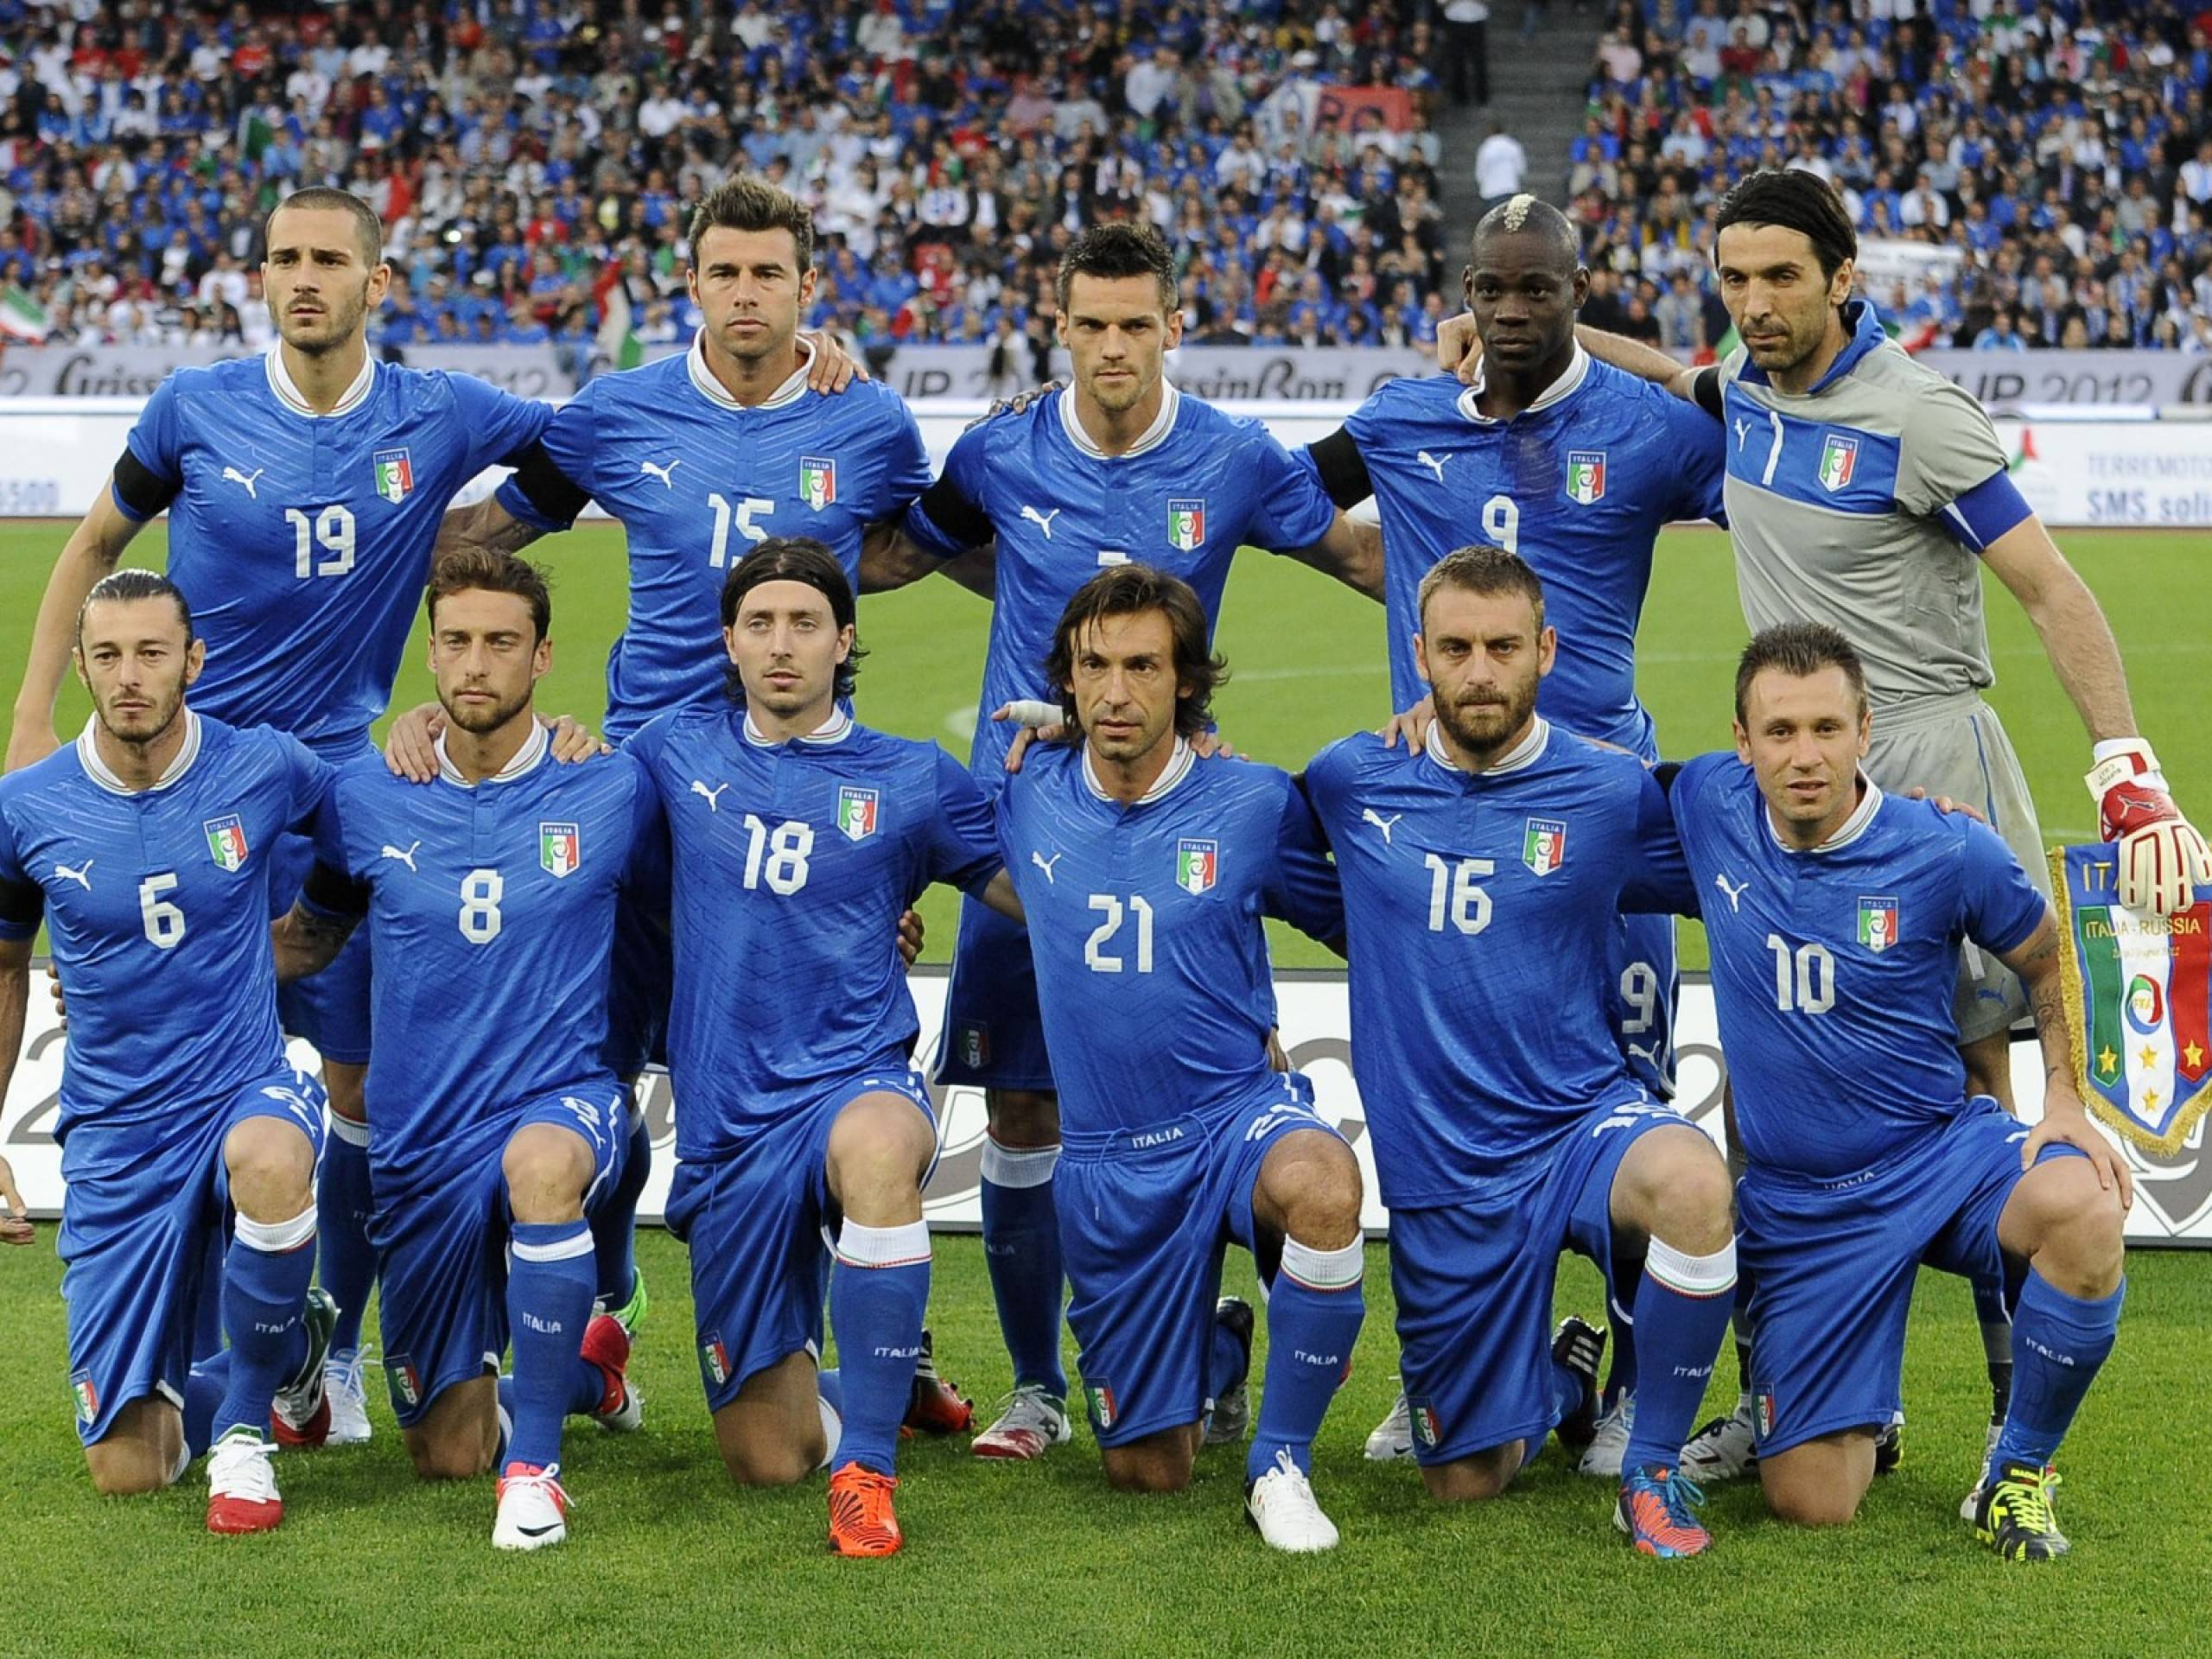 National Football Teams Hd Wallpapers